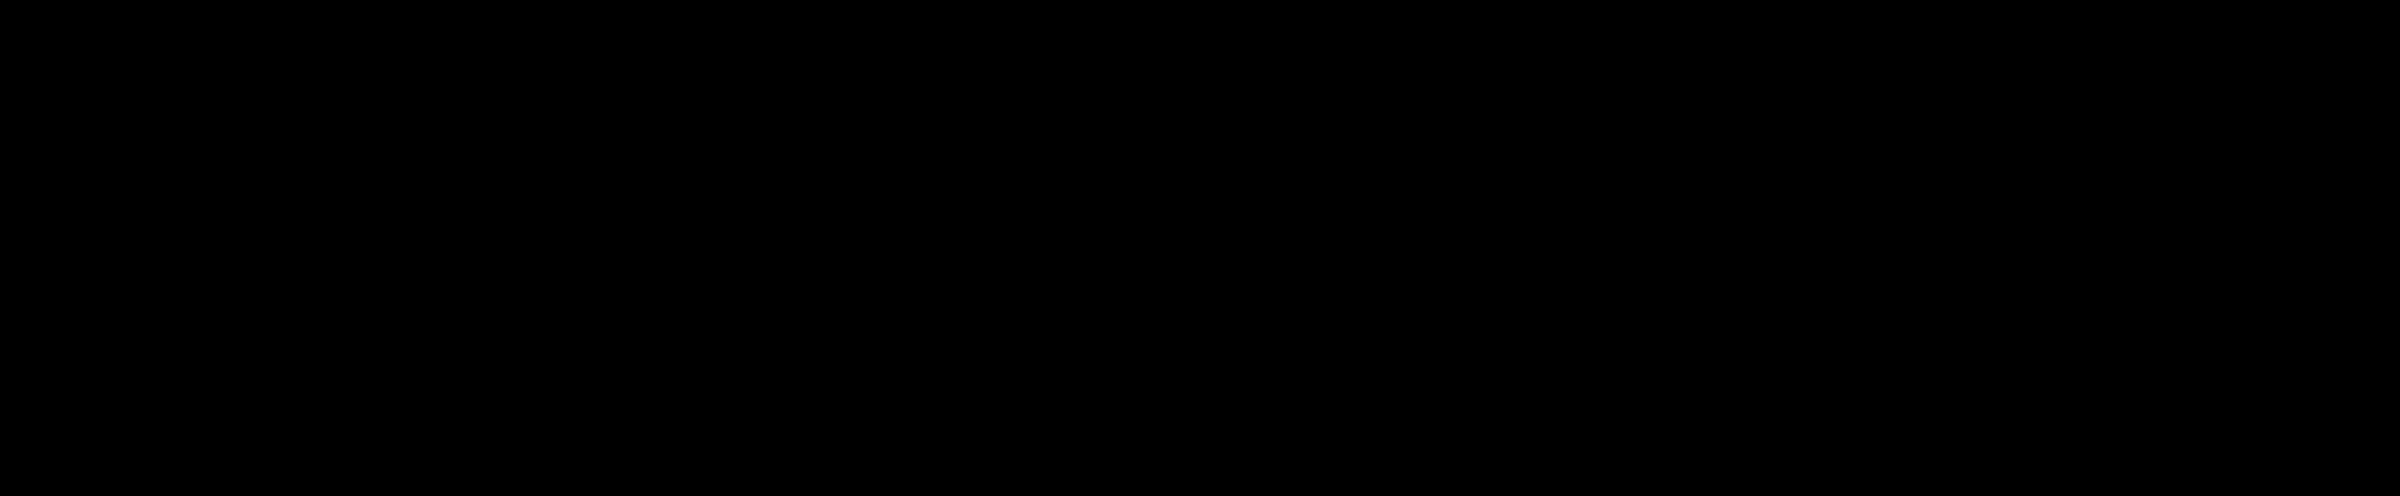 calvin-klein-logo-png-calvin-klein-logo-png-transparent-2400.png